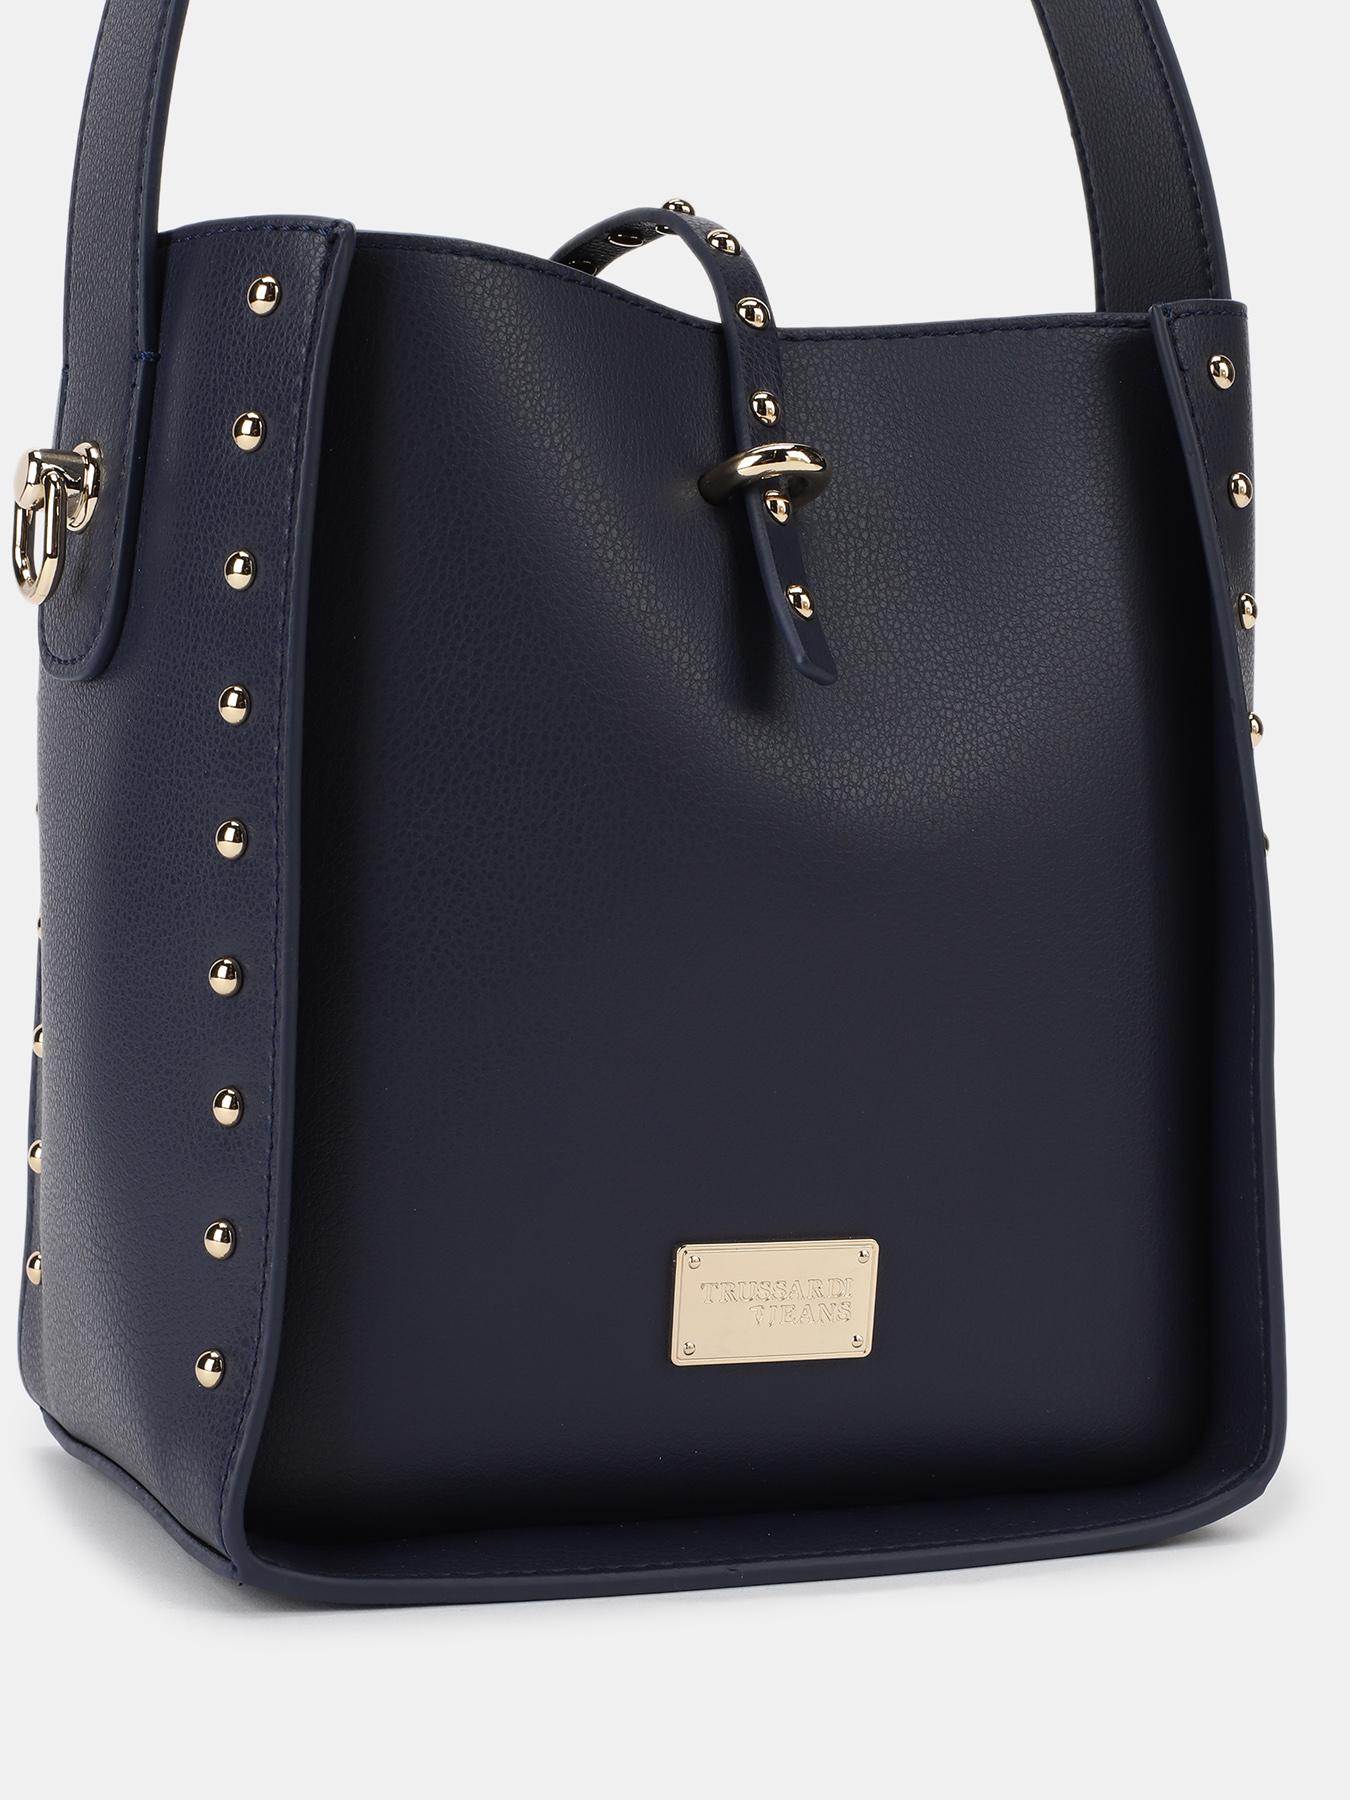 Trussardi Jeans Женская сумка 2 в 1 365205-185 Фото 4